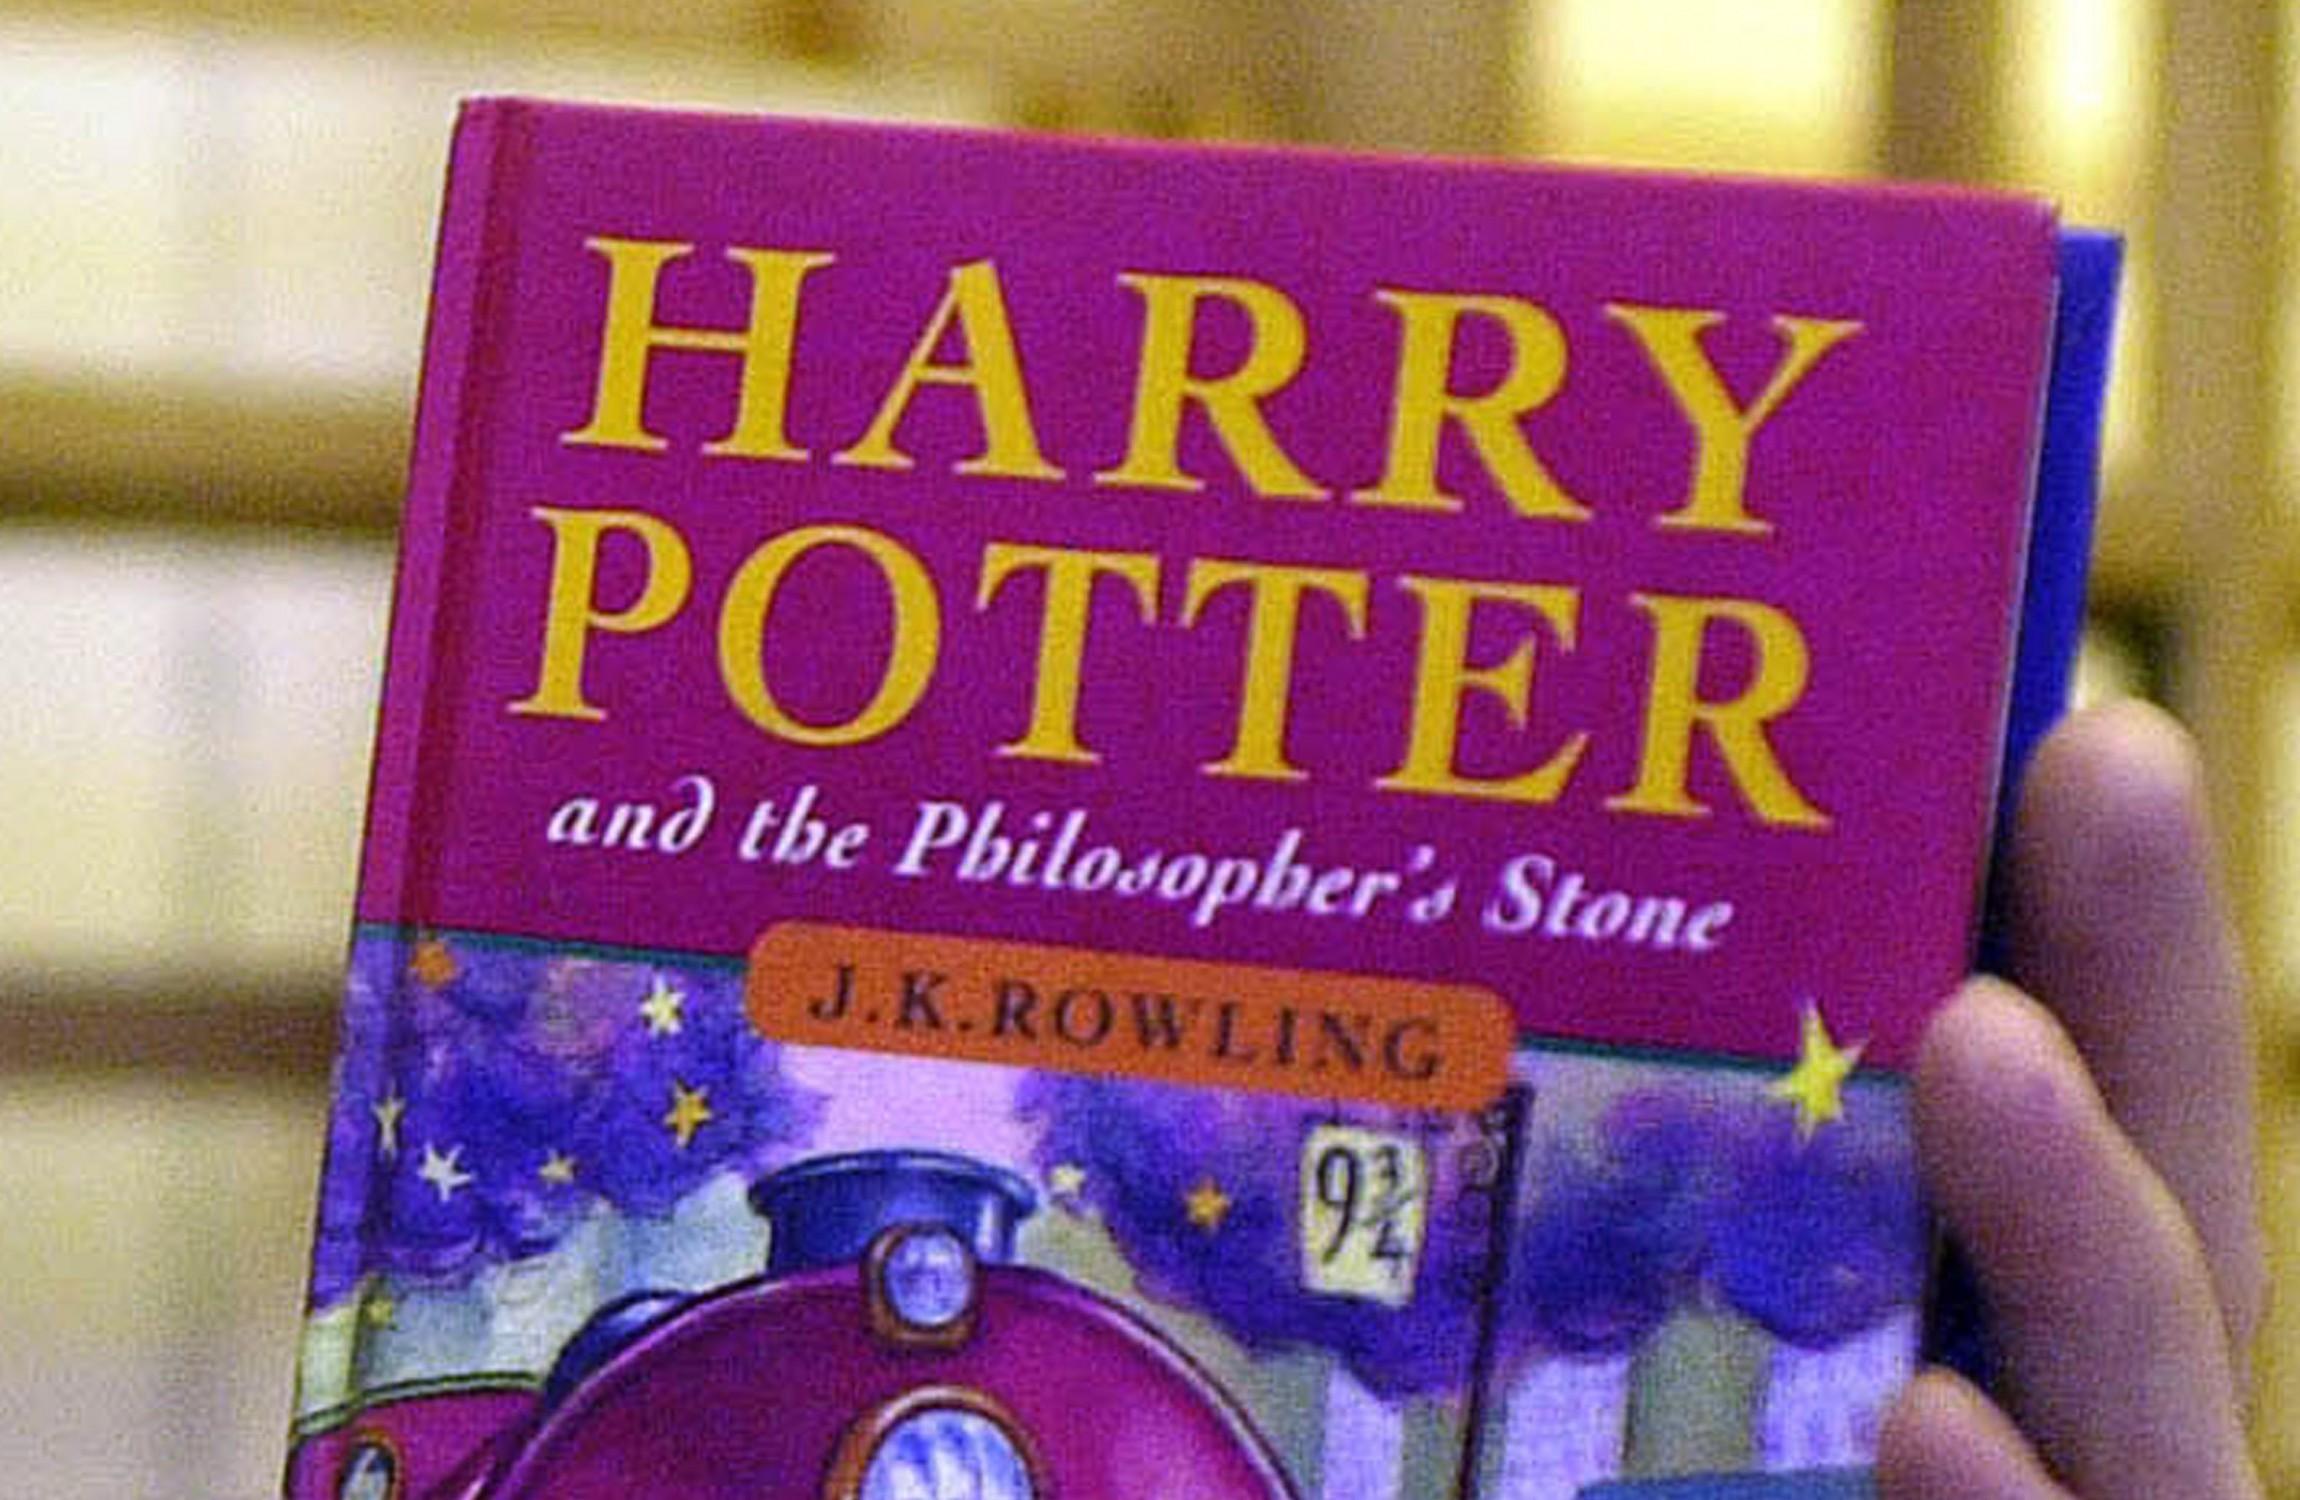 20 years on Harry Potter still making magic